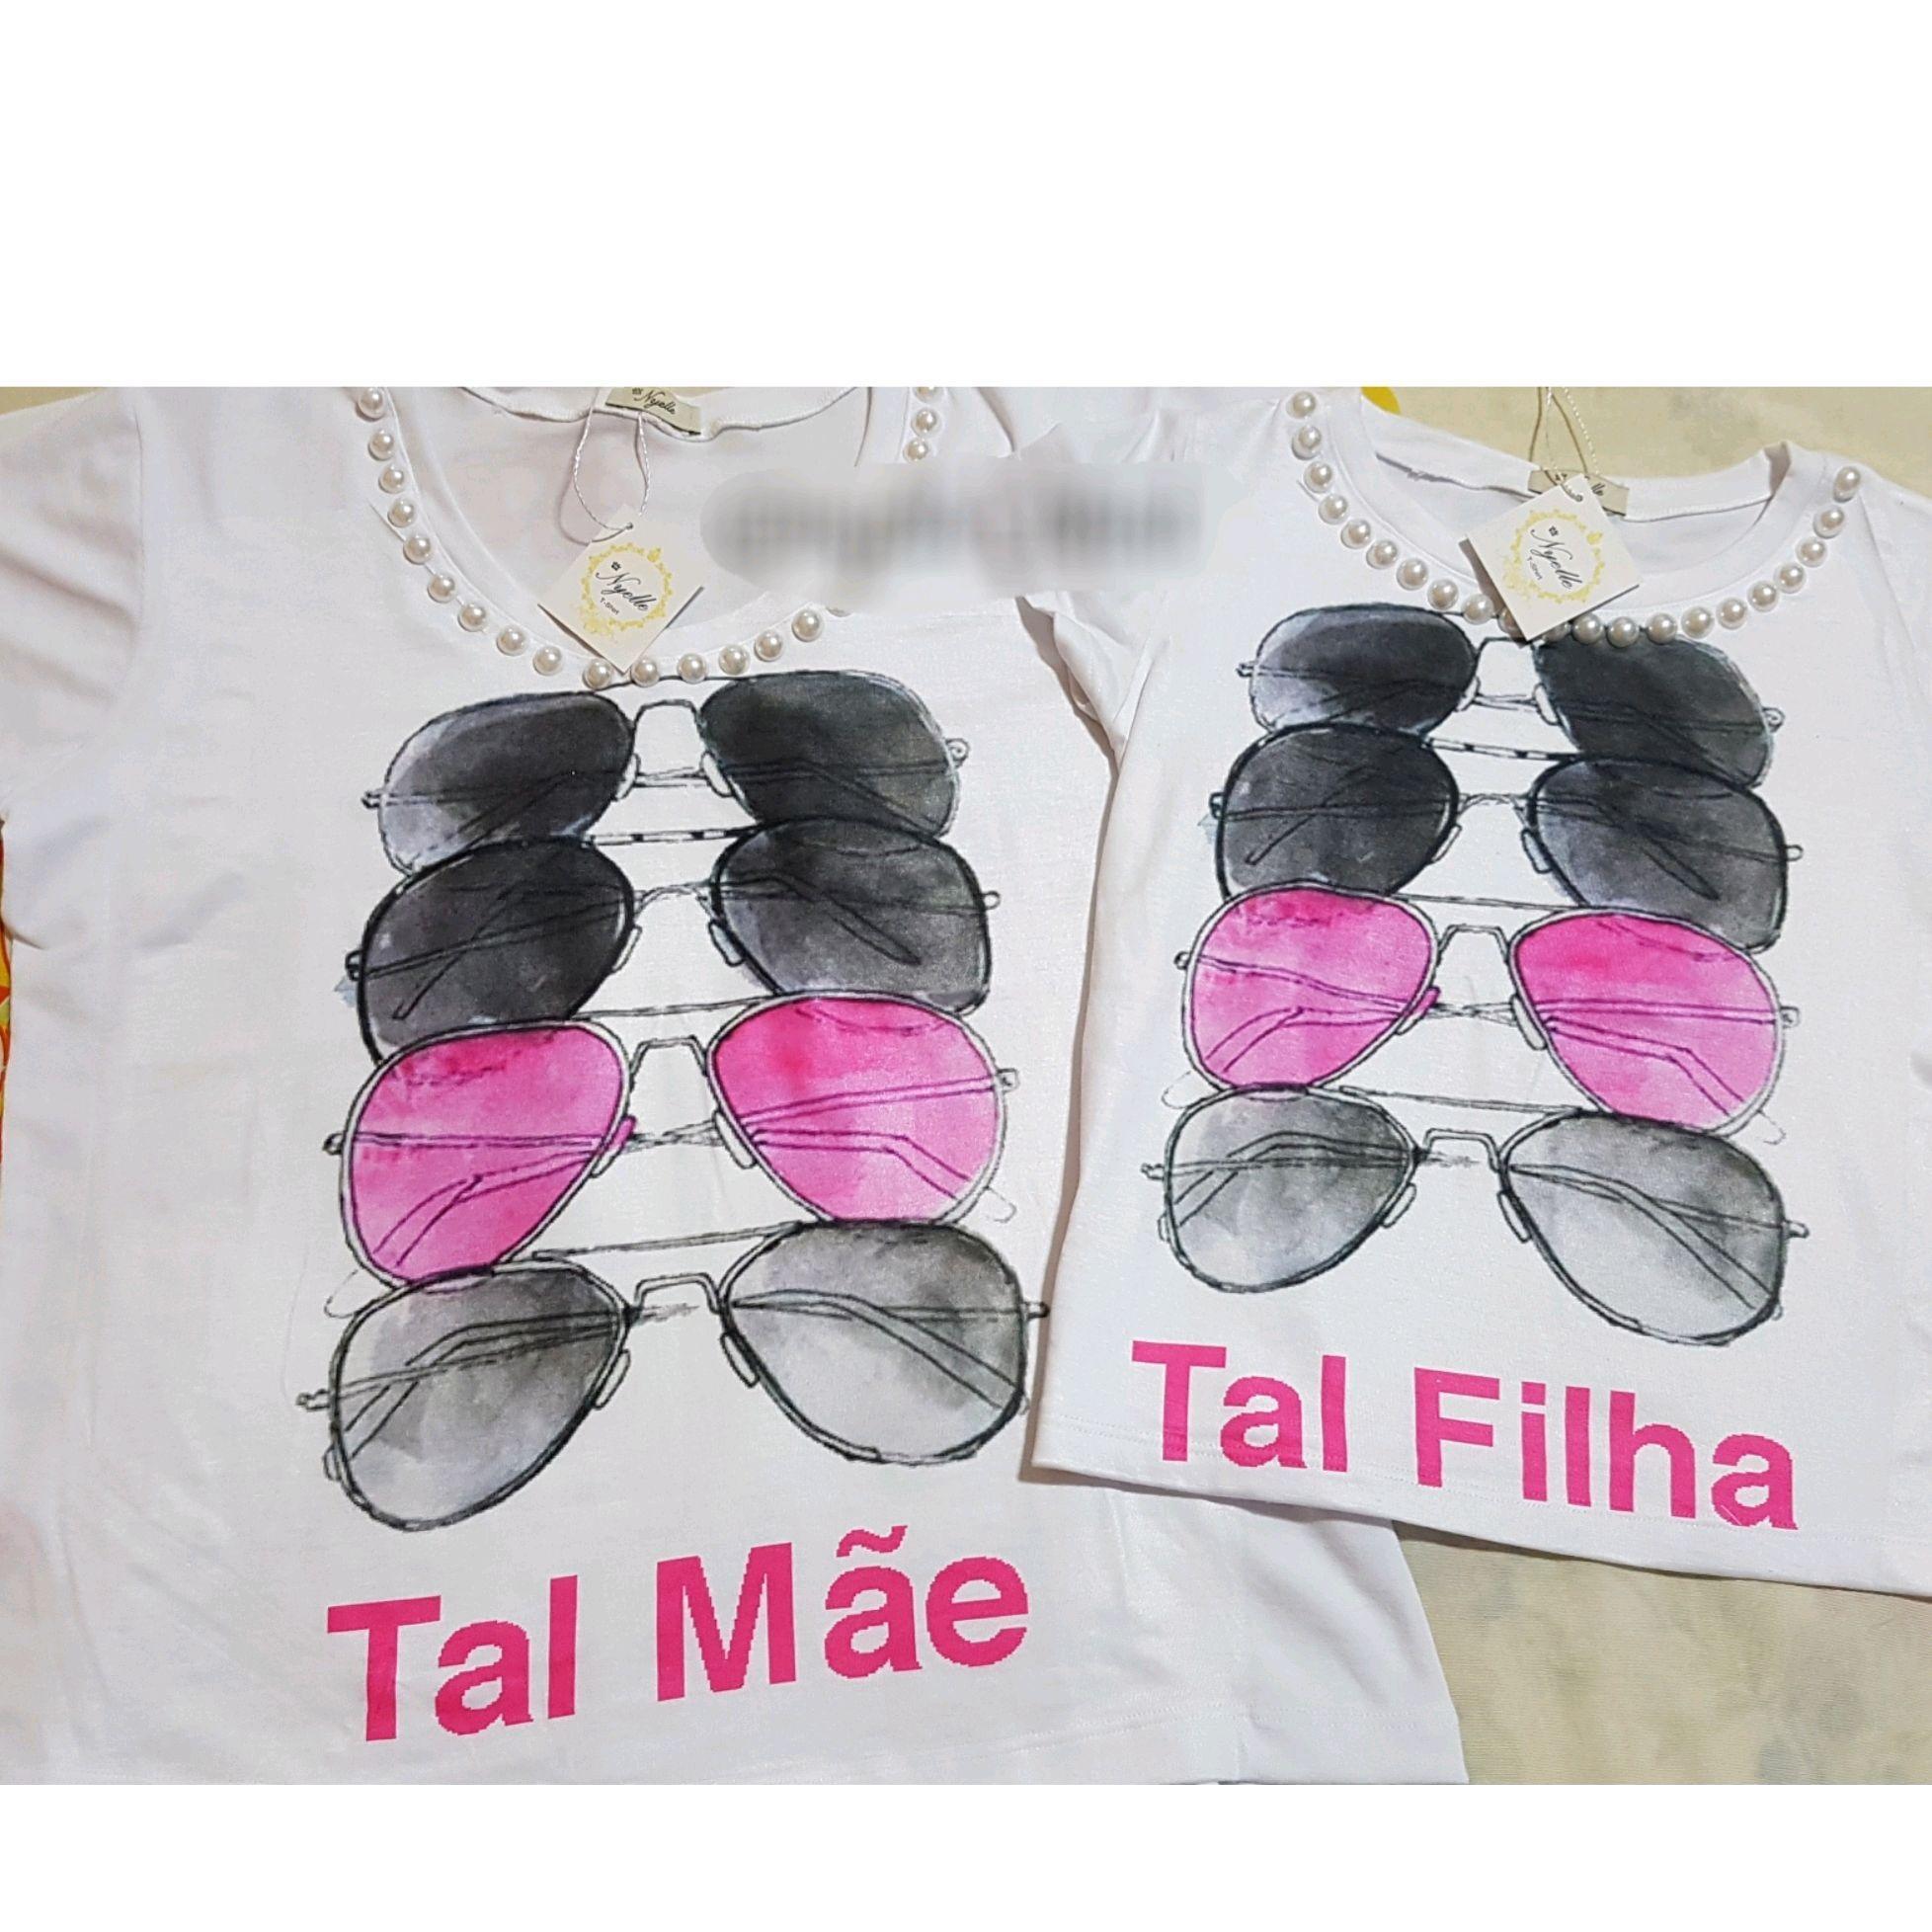 9fe023182 Camiseta Feminina - Tal Mãe, Tal Filha - Óculos Ray Ban no Elo7   Nyelle  T-Shirt (B09002)